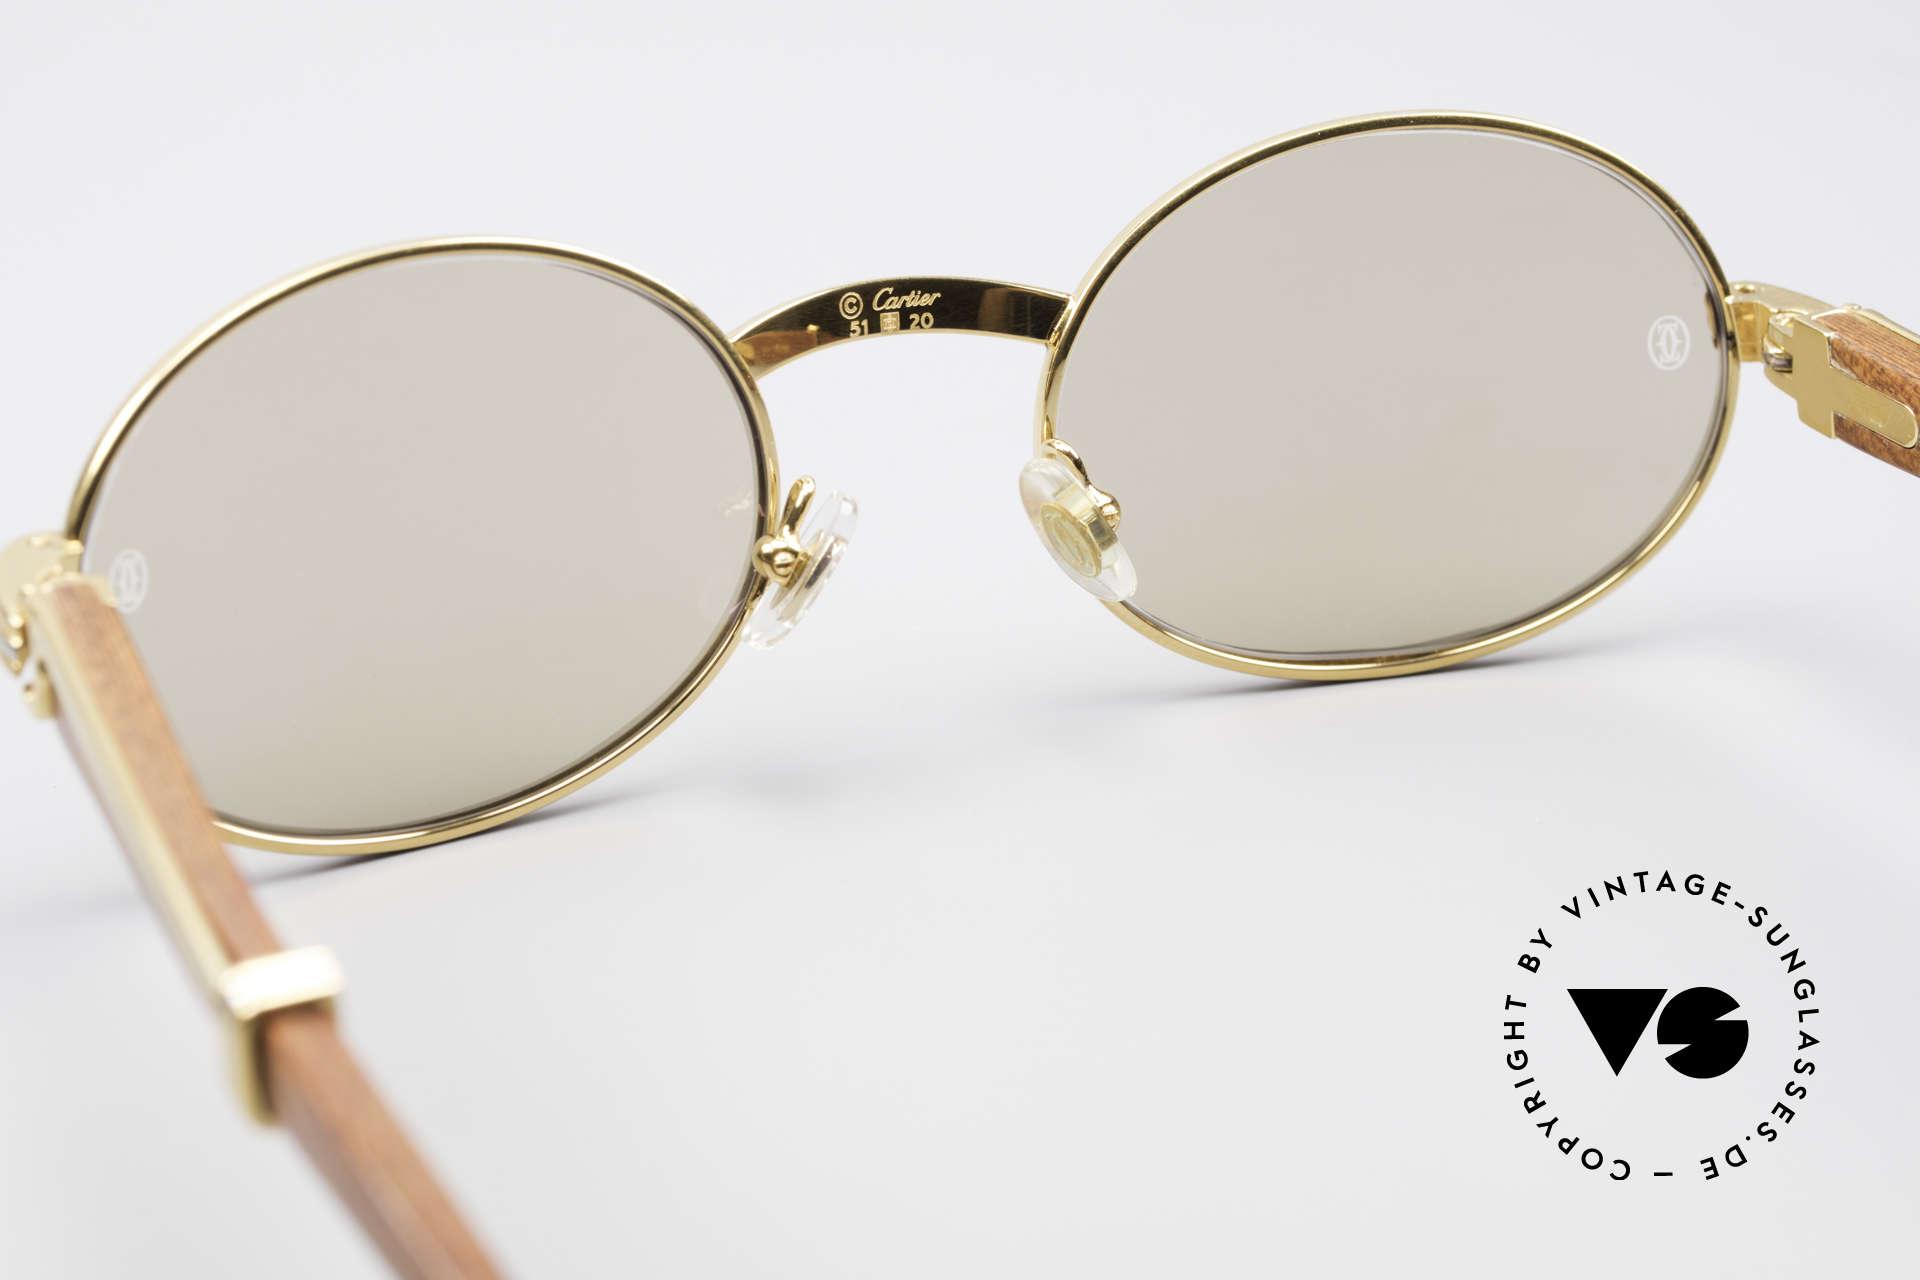 898f624da8 Sonnenbrillen Cartier Giverny Ovale Edelholz Sonnenbrille